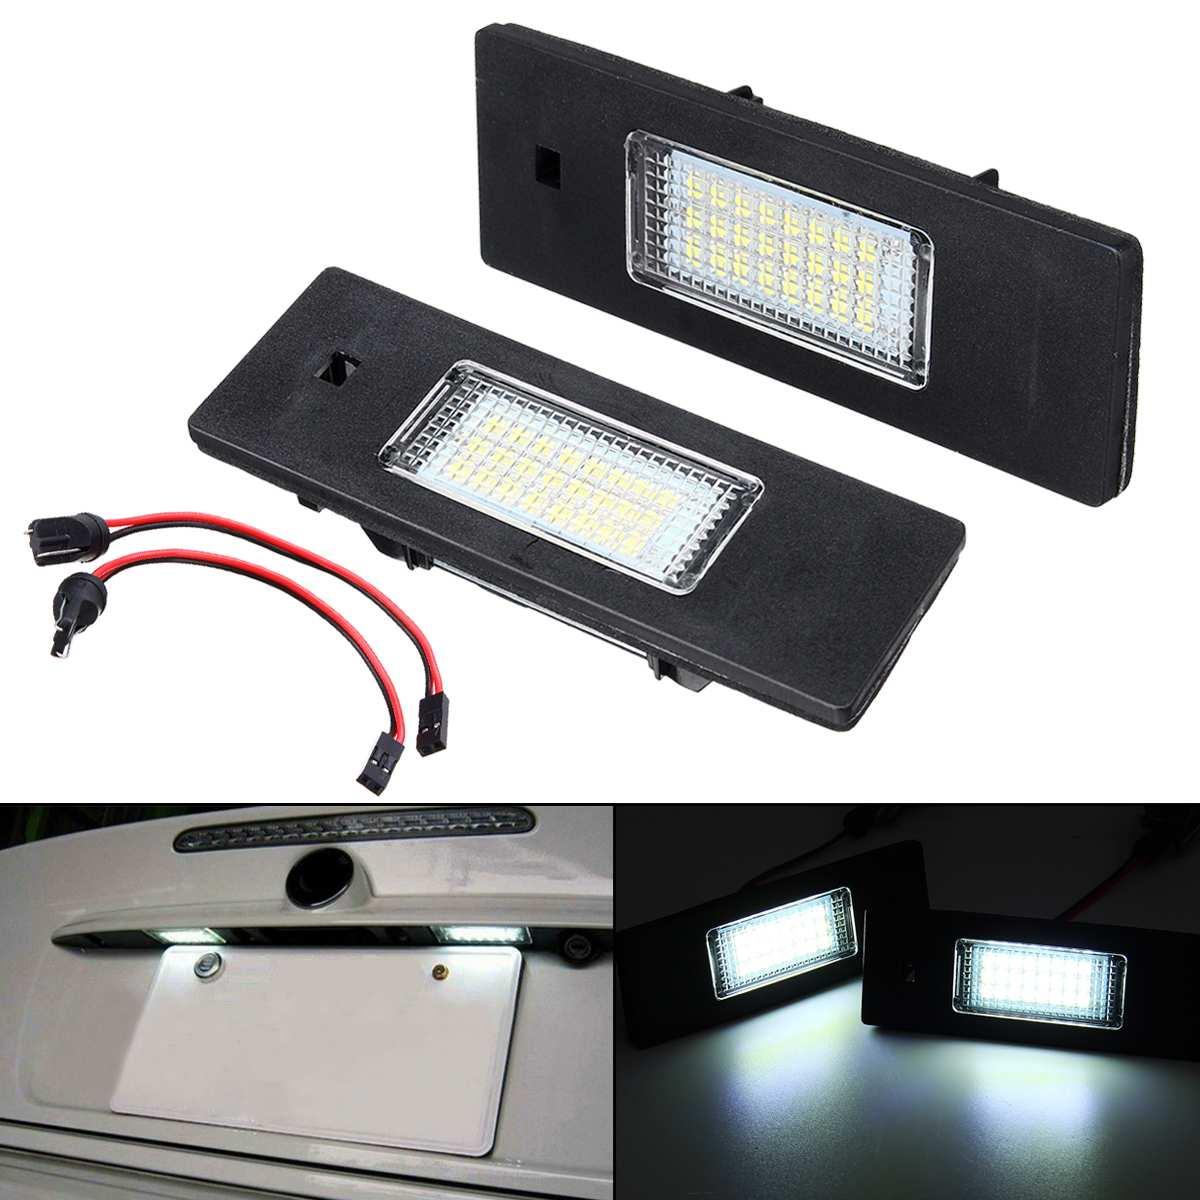 2X LED Number License Plate Light Lamp Error Free For BMW E81 E87 E63 E64 M6 E85 E86 E9 Z4 F20 F21 F06 F12 F13 Mini Cooper